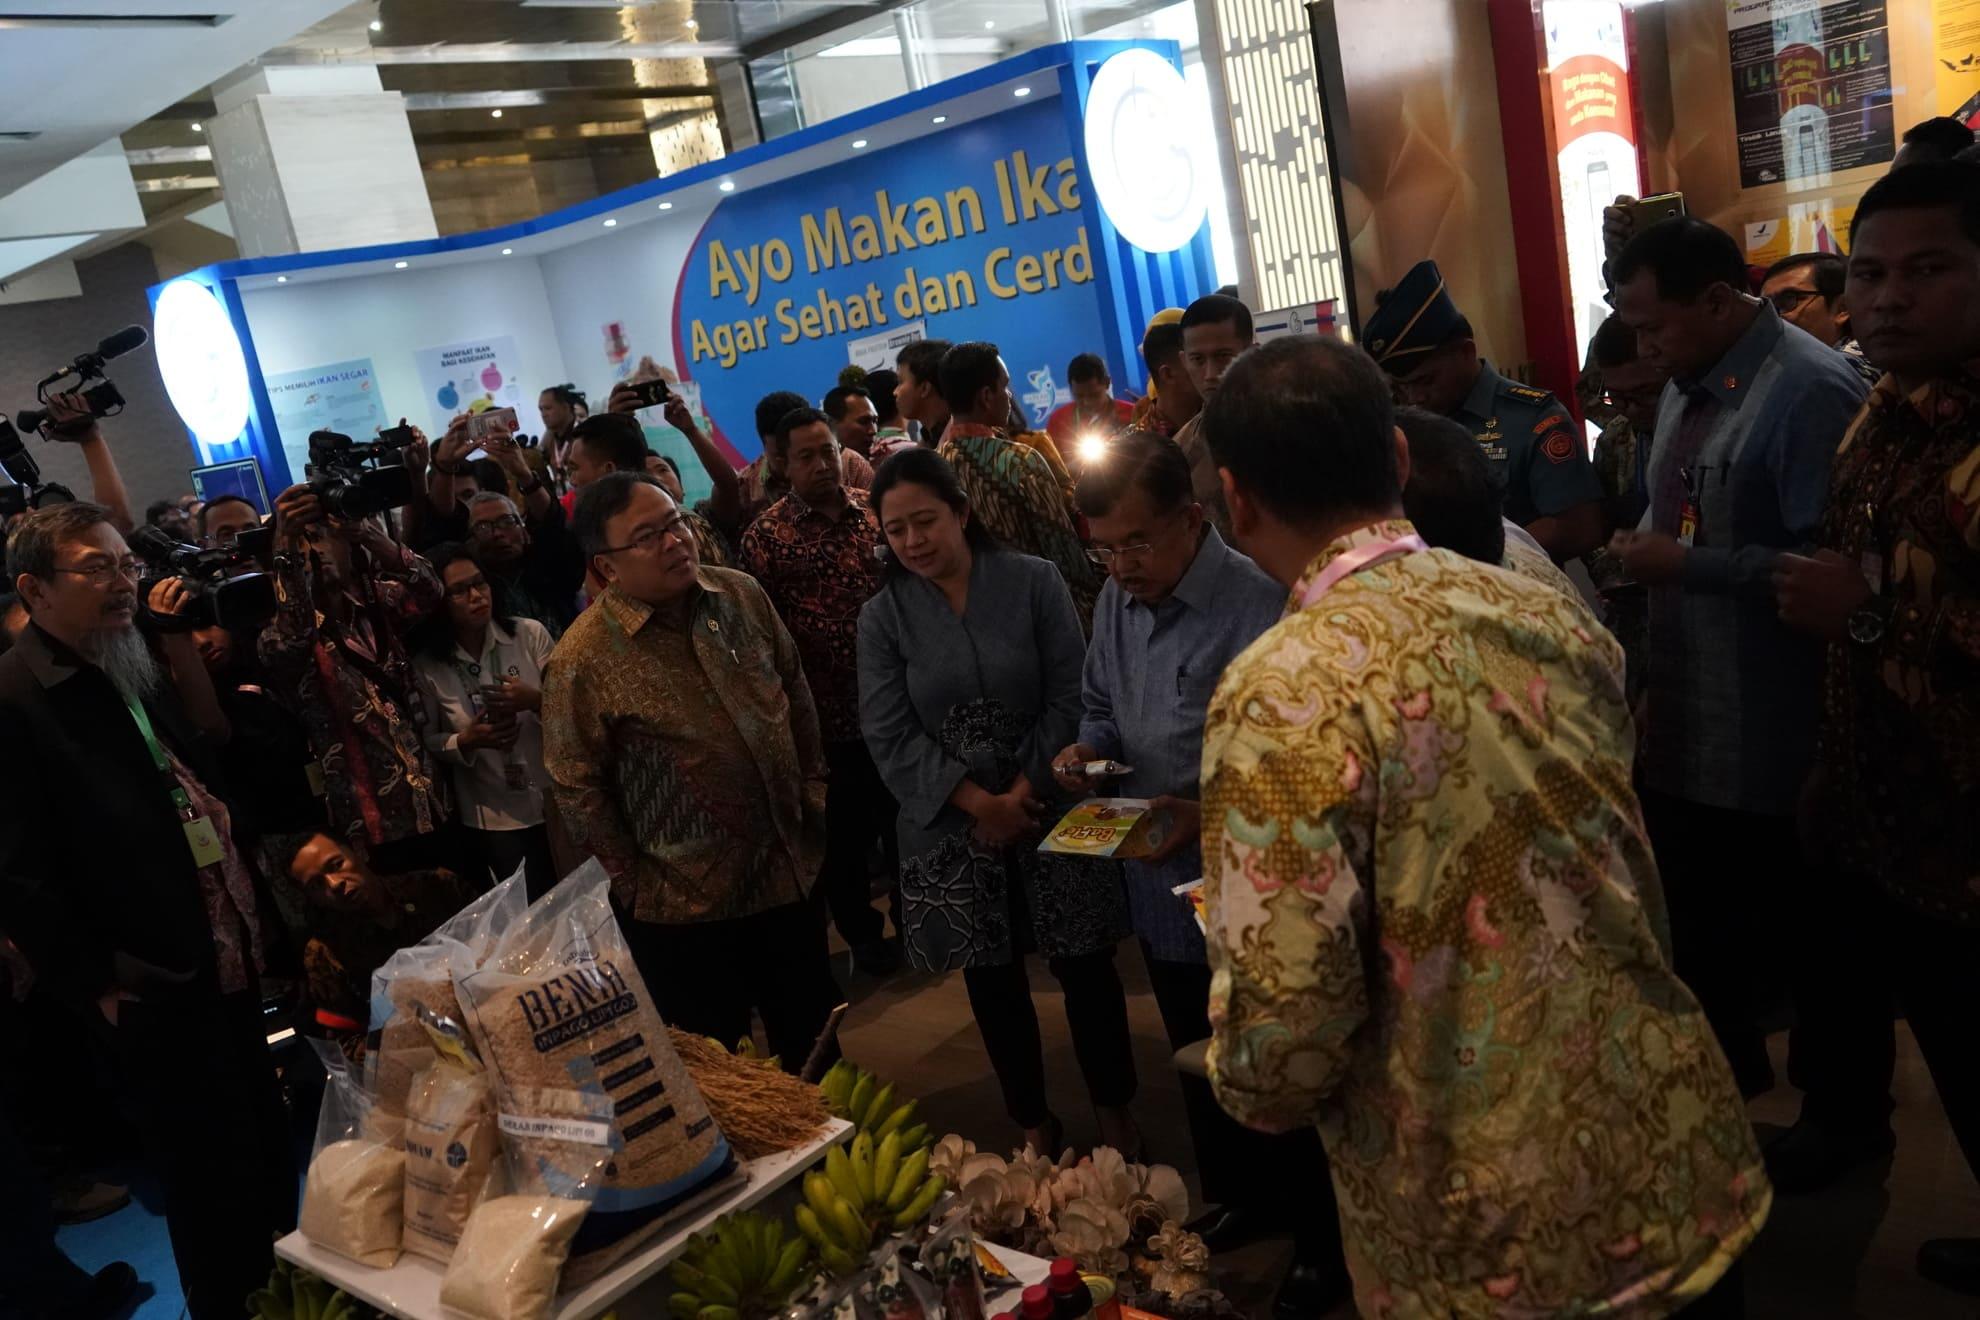 3-7-2018-wapres-dan-menko-pmk-meninjau-pameran-pd-widyakarya-nasional-pangan-dan-gizi-xi